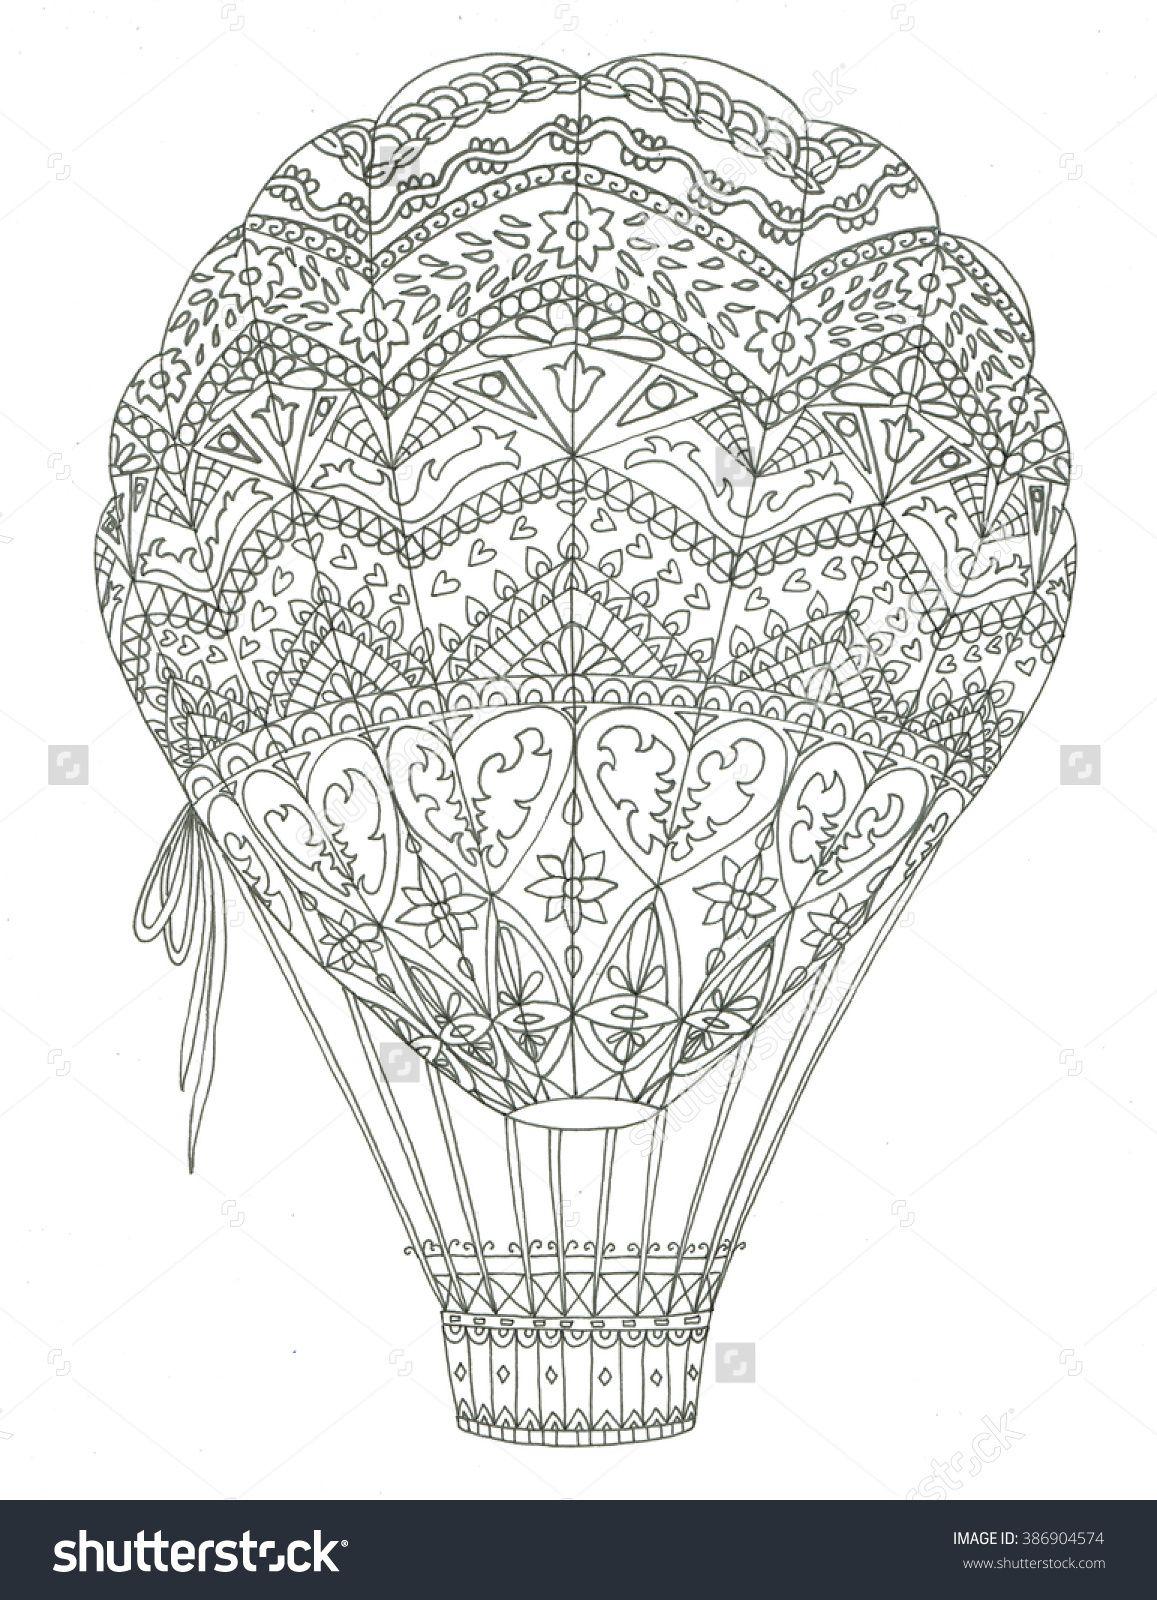 Printable Hot Air Balloon Coloring Page Free Pdf Download At Http Coloringcafe Com Coloring Pages Hot Hot Air Balloon Craft Hot Air Balloon Drawing Balloons